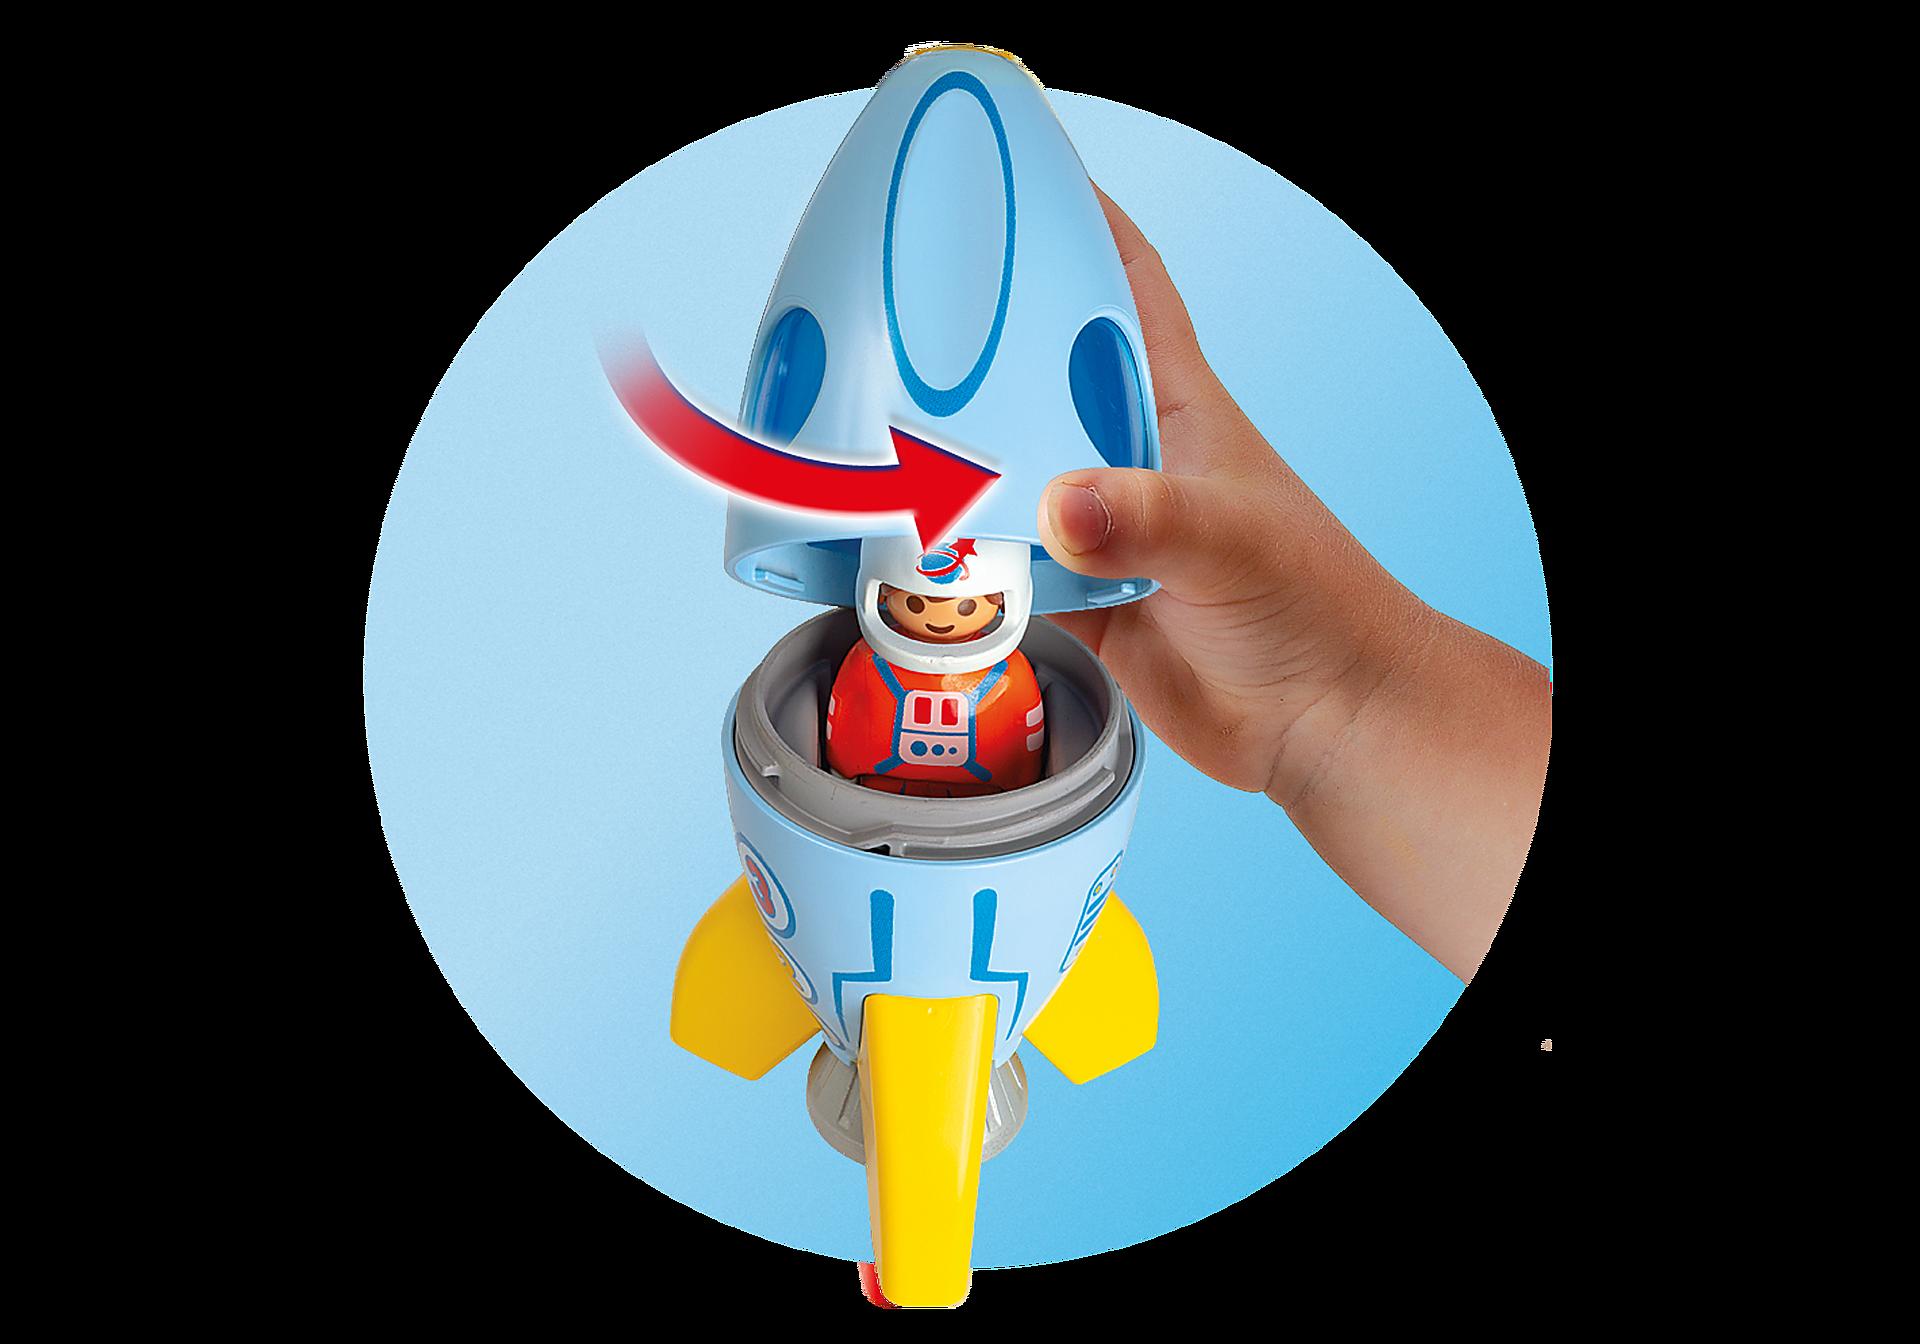 http://media.playmobil.com/i/playmobil/70186_product_extra1/Astronaut mit Rakete